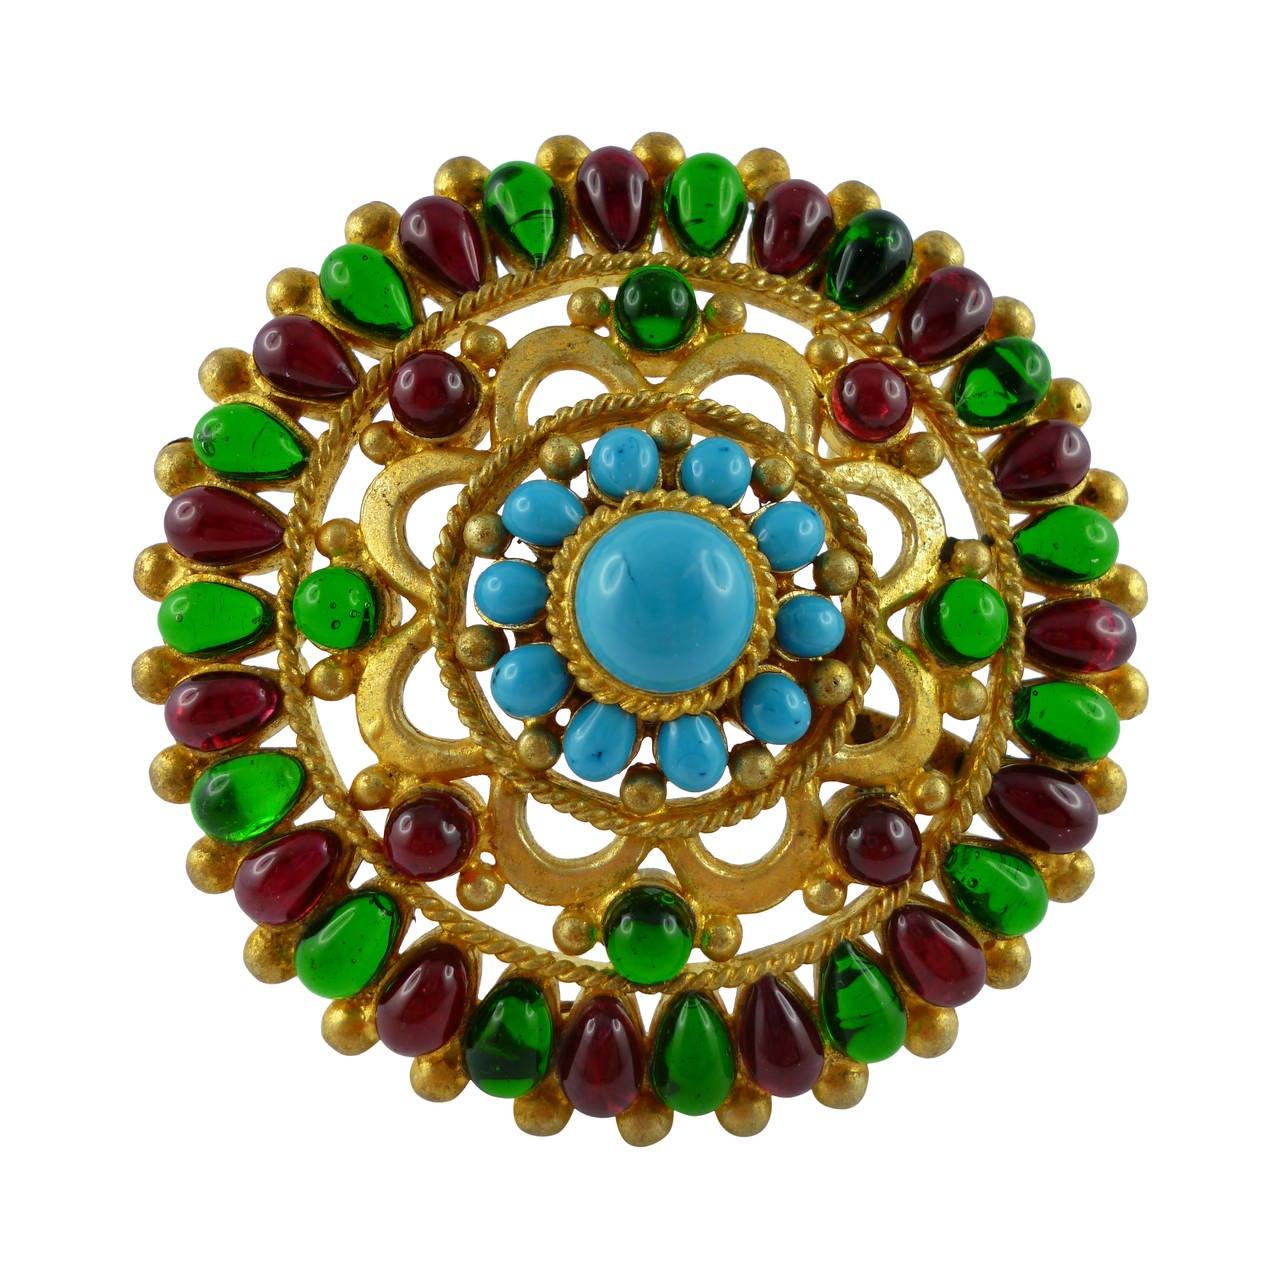 Chanel Massive Gripoix Mughal Brooch Pendant Fall 1993 For Sale